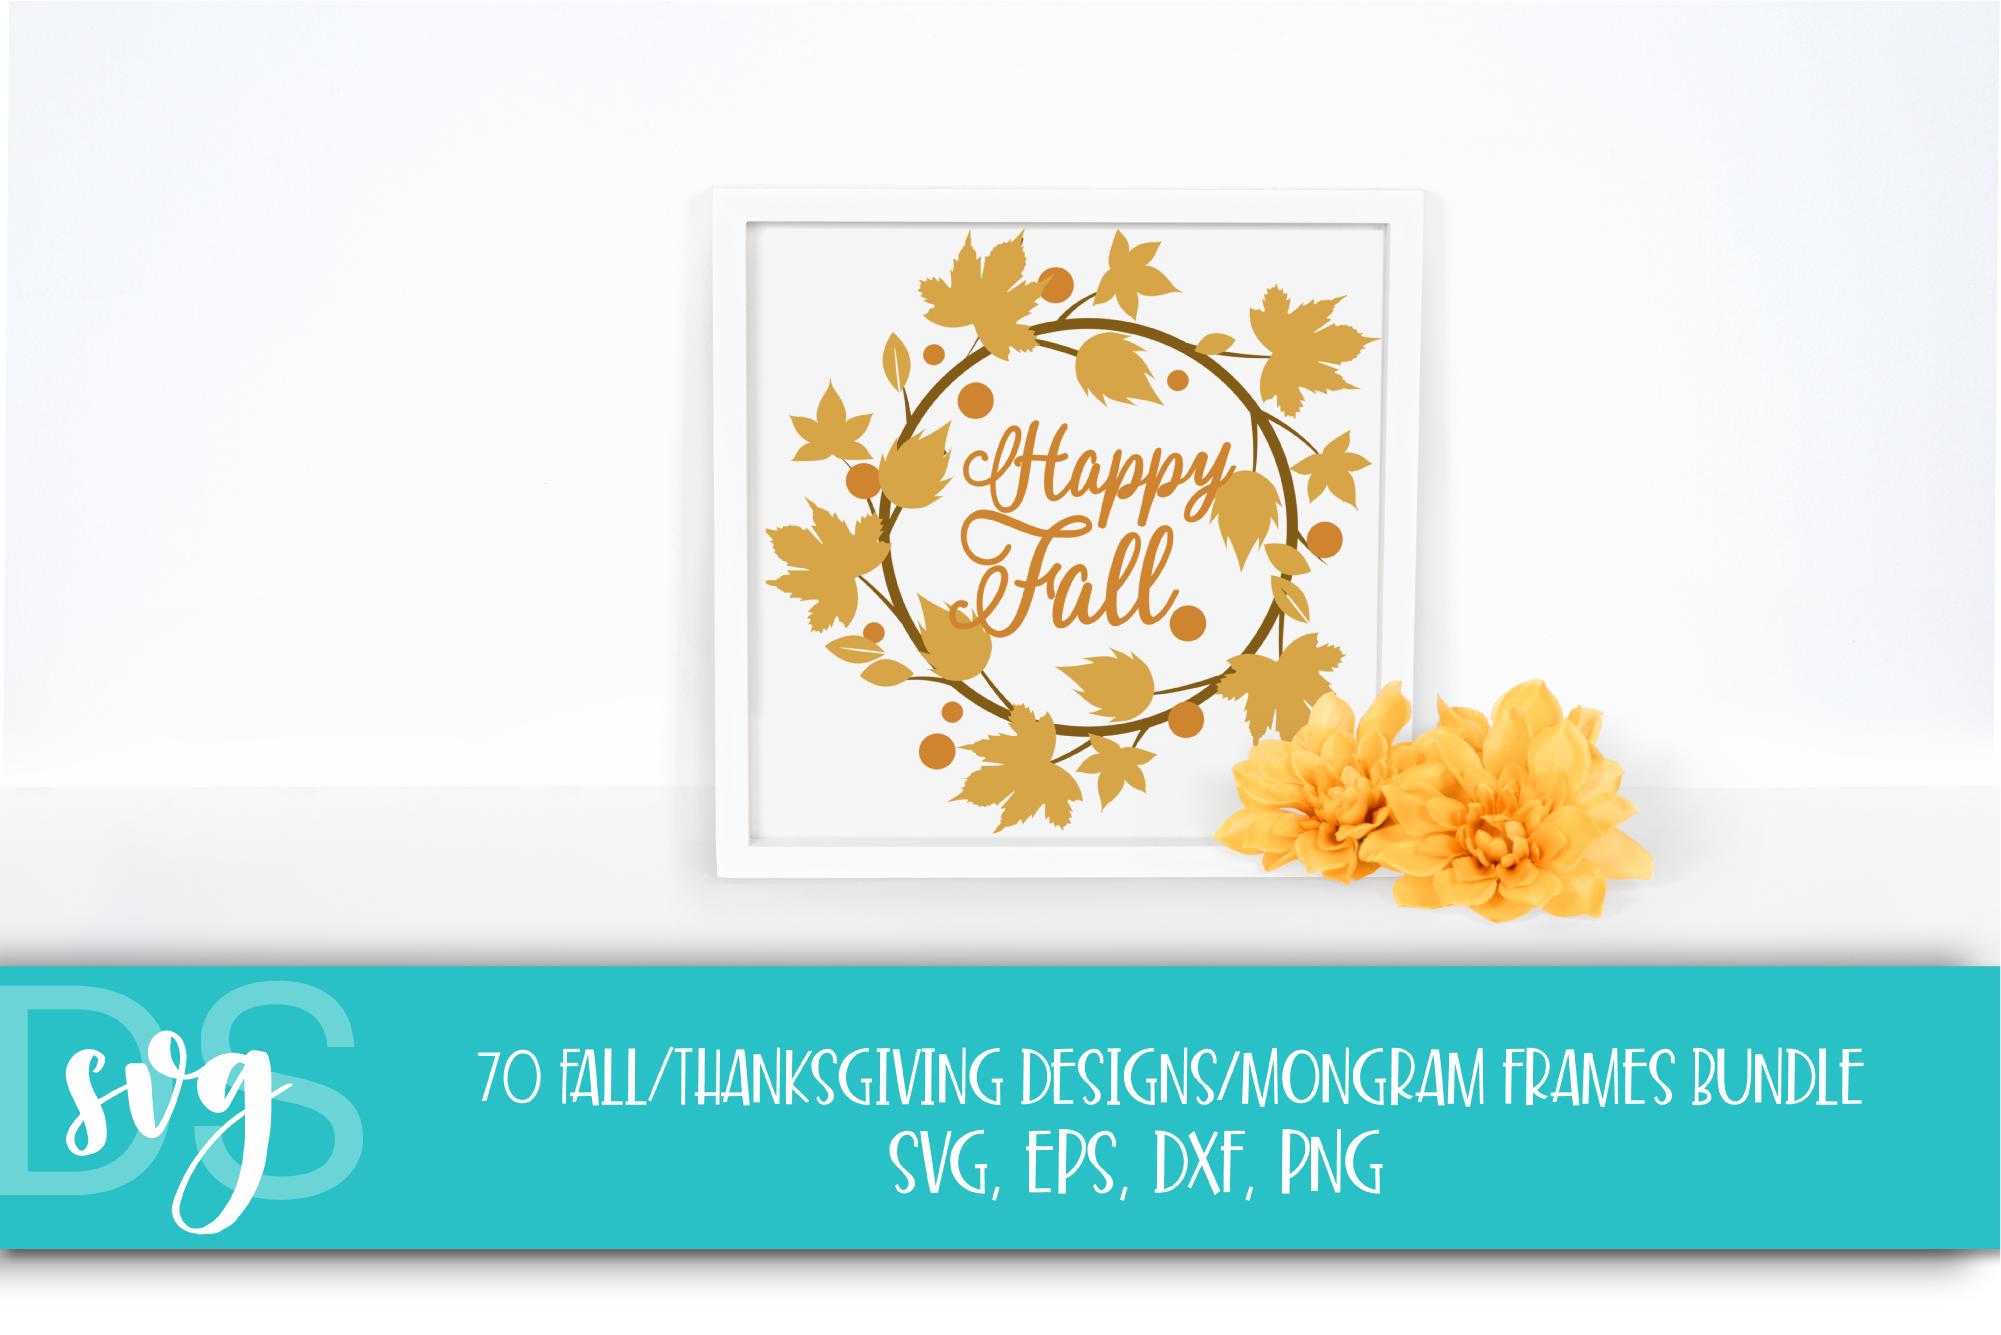 Fall, Pumpkin, Halloween, SVG, PNG, Thanksgiving Bundle, example image 4